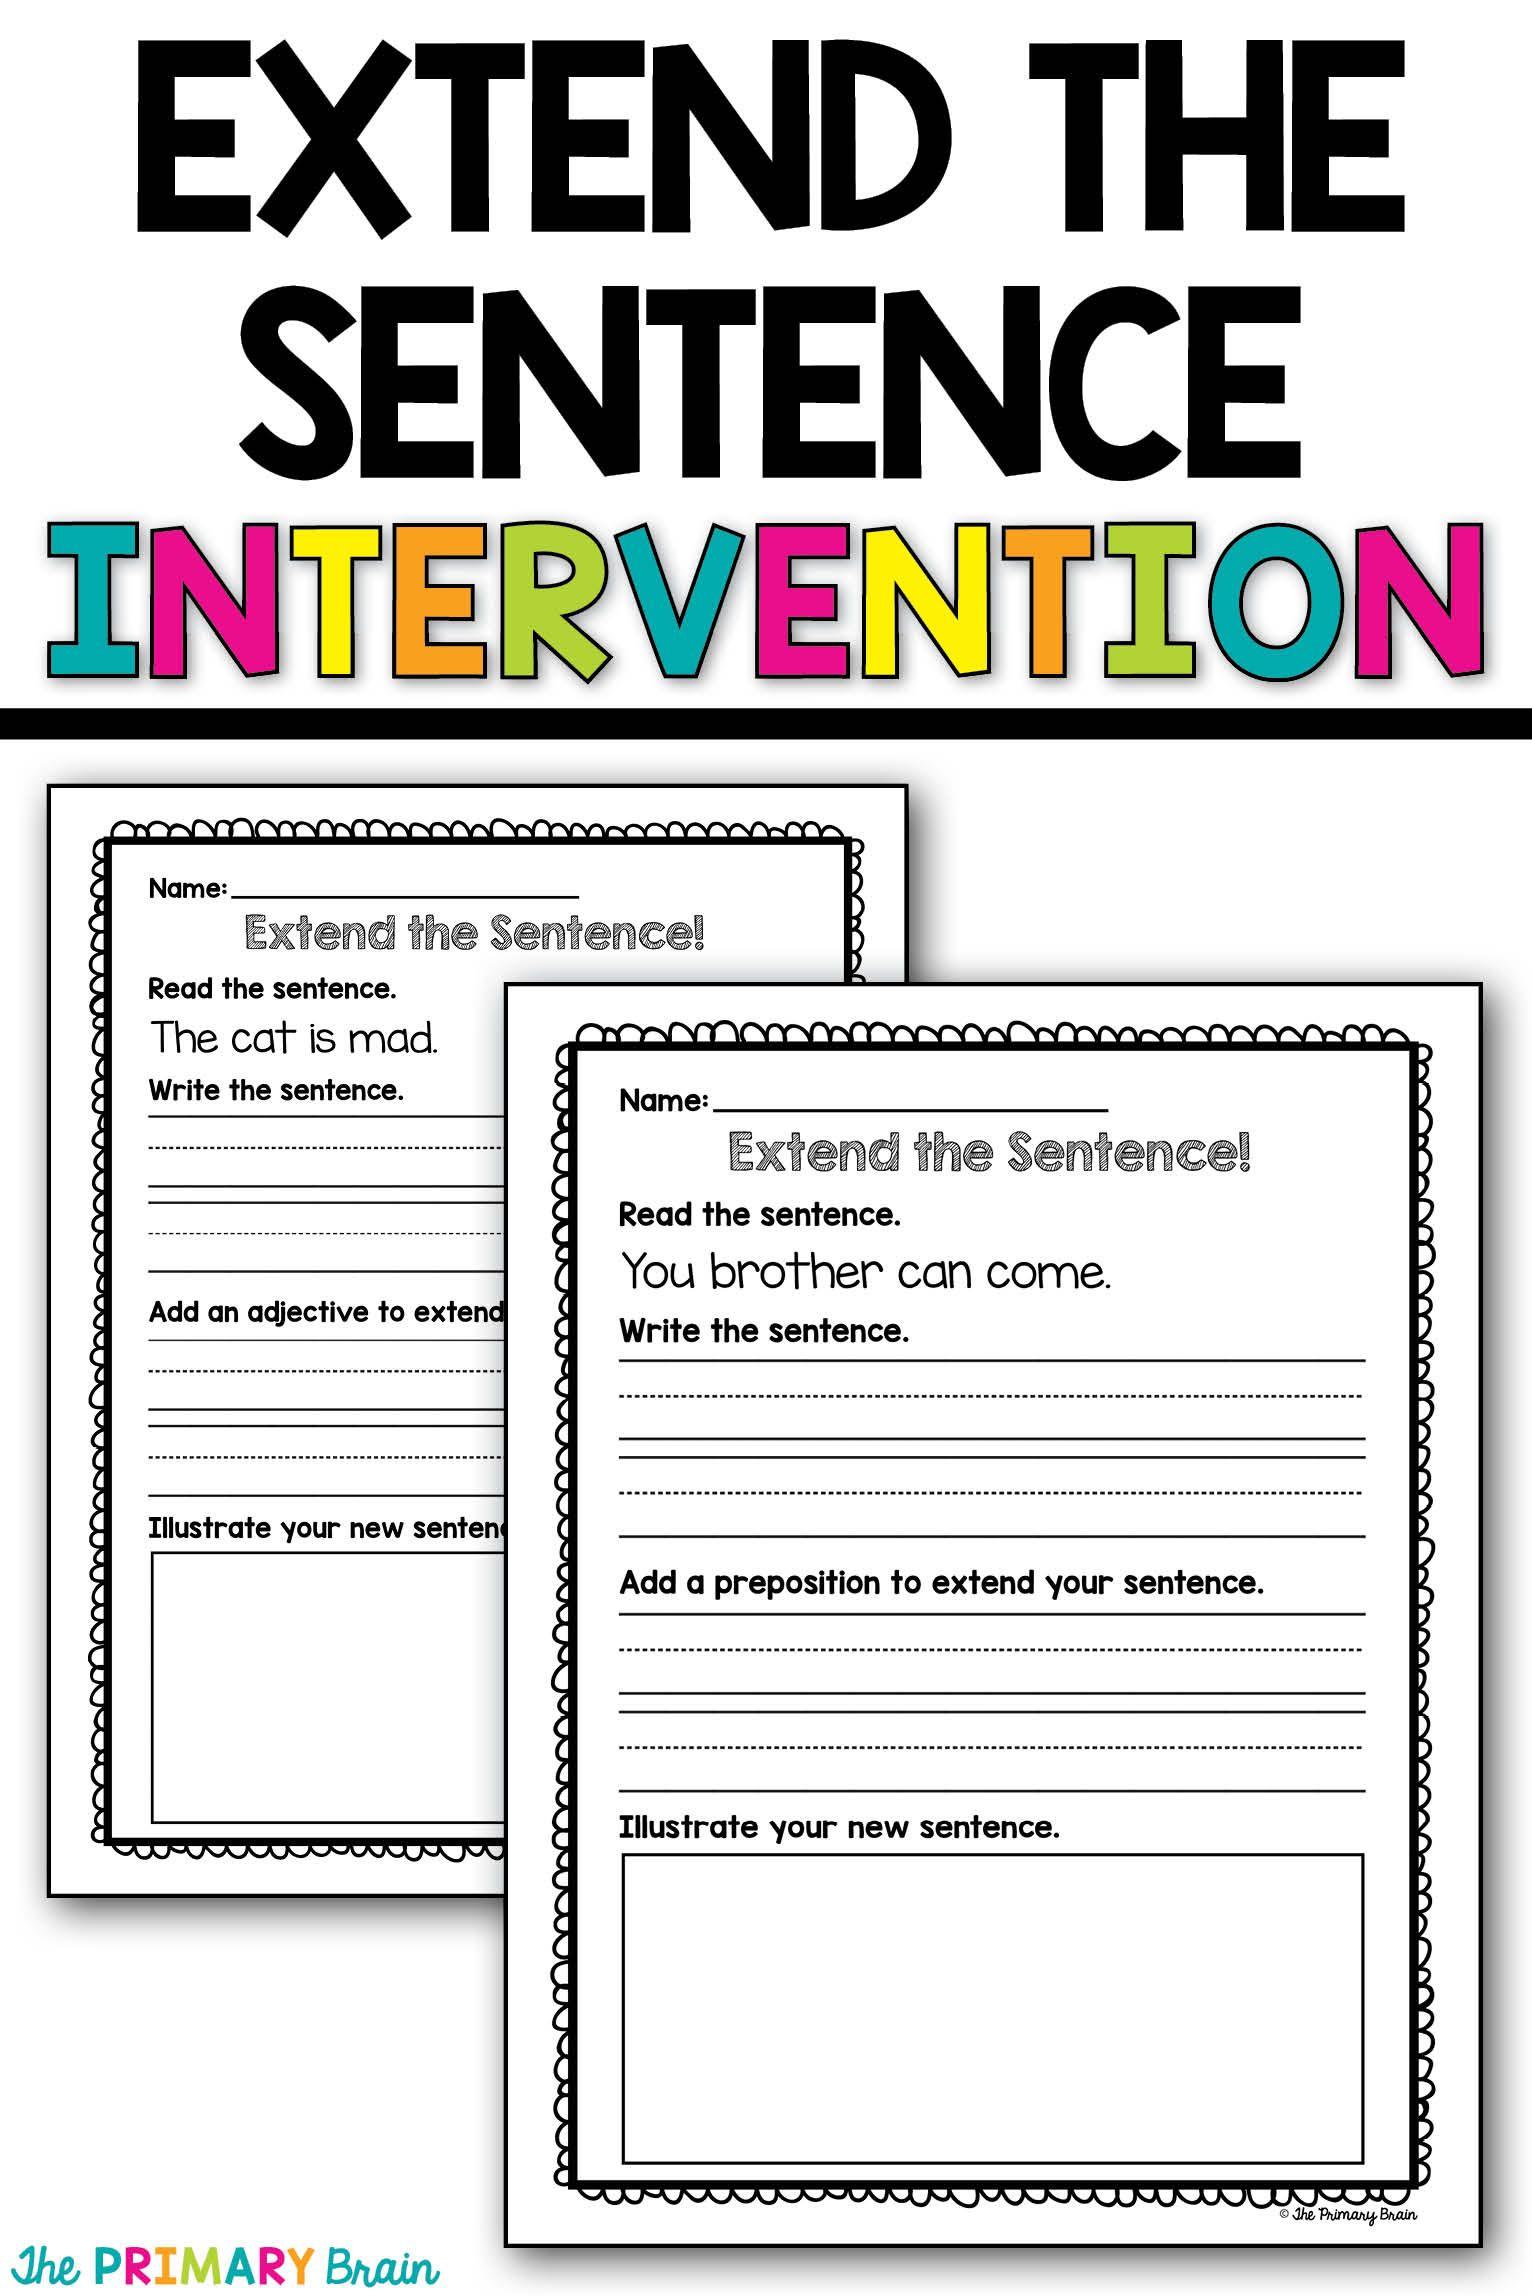 extend a sentence writing intervention activity first grade language arts sentence writing. Black Bedroom Furniture Sets. Home Design Ideas